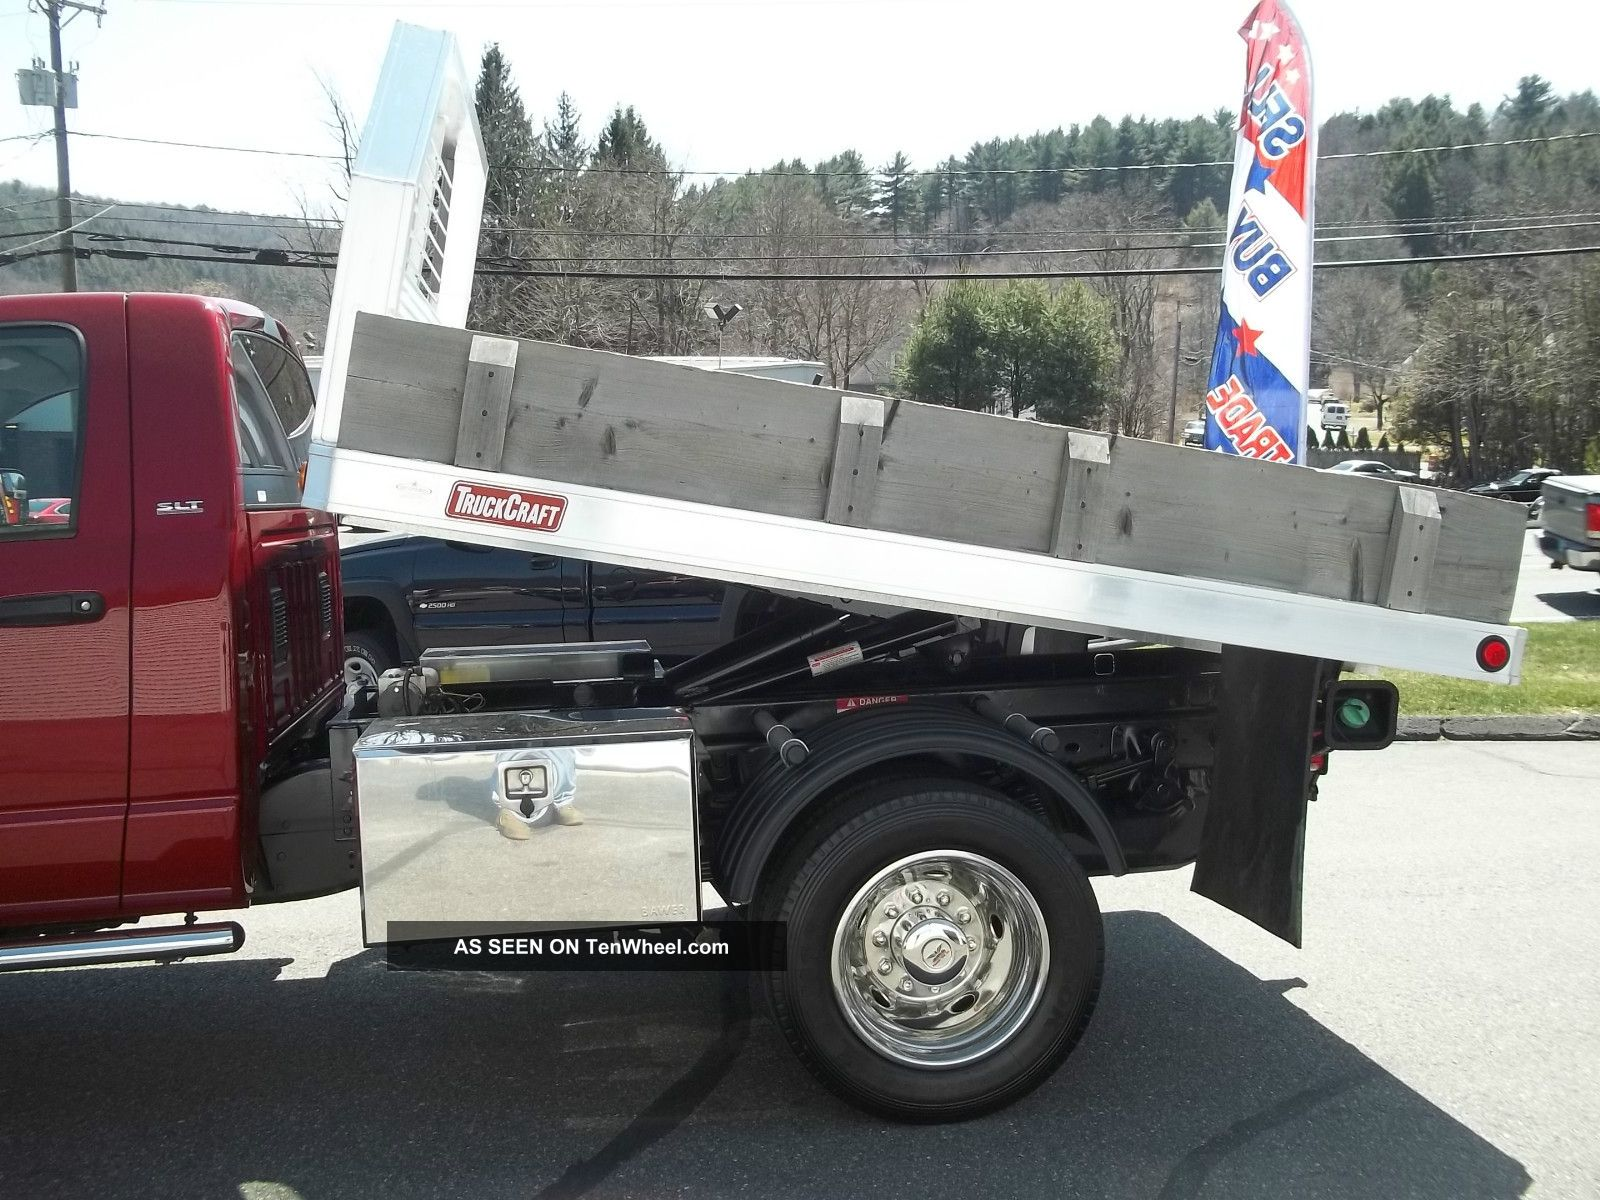 2009 Dodge Ram 5500 Cummins Diesel Flatbed Dump 4x4 Slt 9ft Boss V Plow